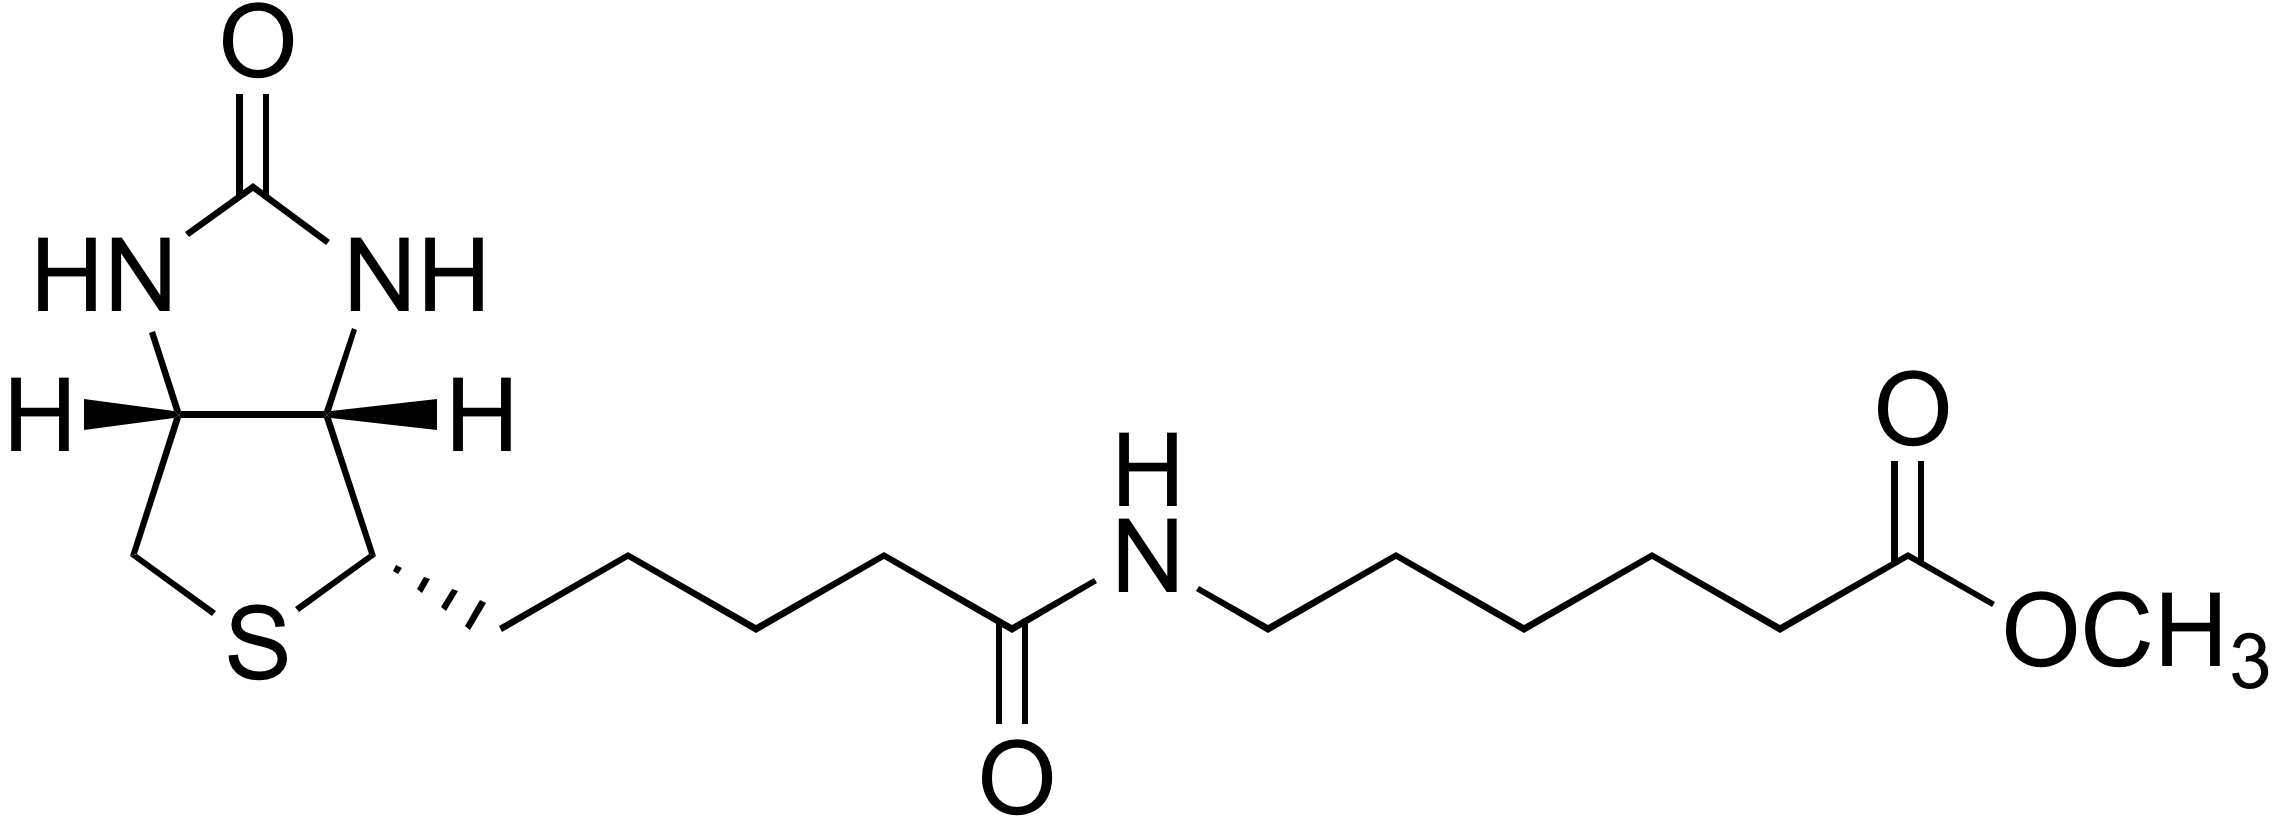 Methyl 6-(+)-biotinylamidohexanoate